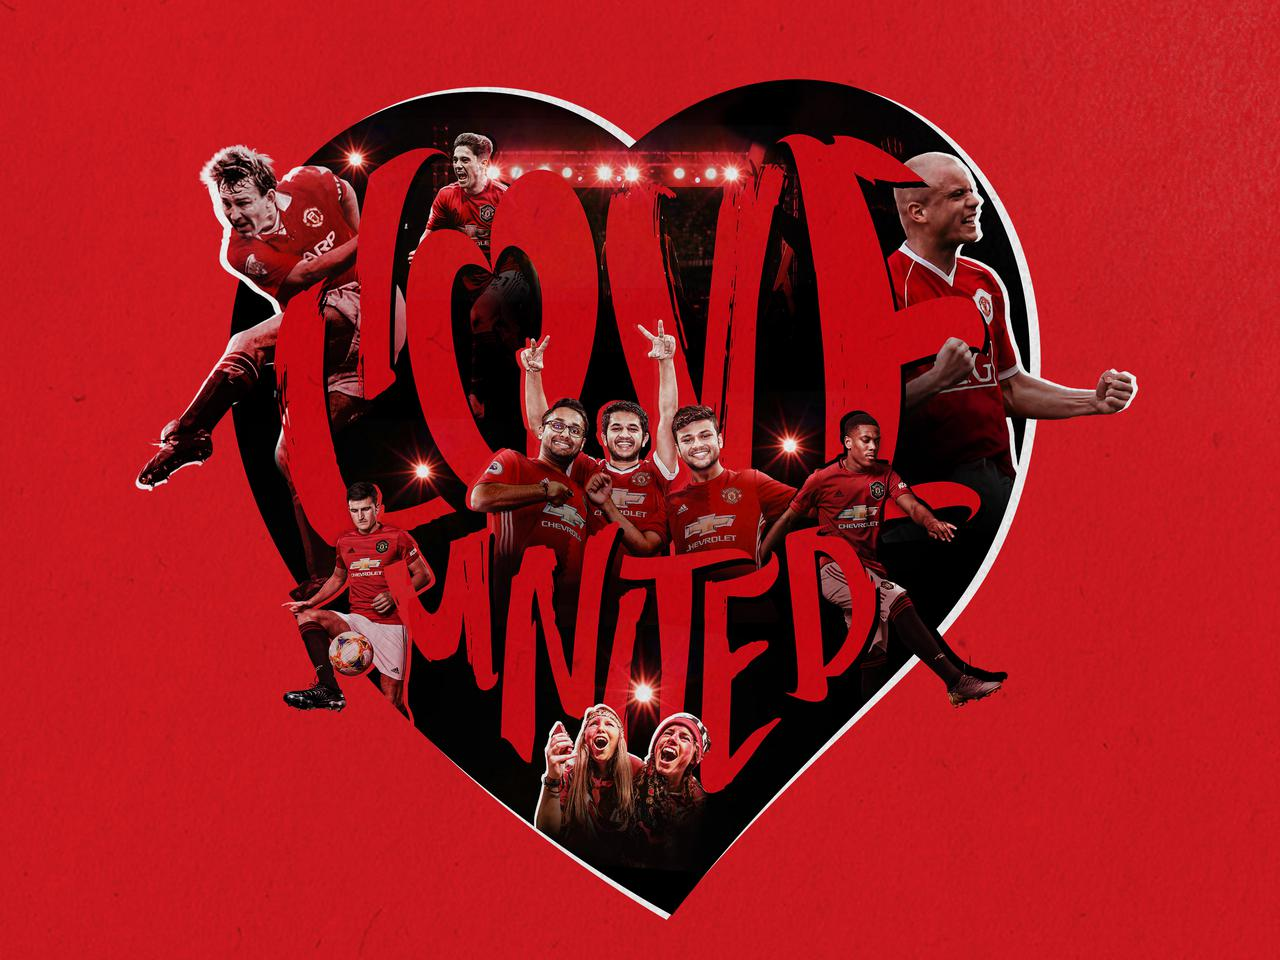 man utd announces i love united fan event in shenzhen china manchester united man utd announces i love united fan